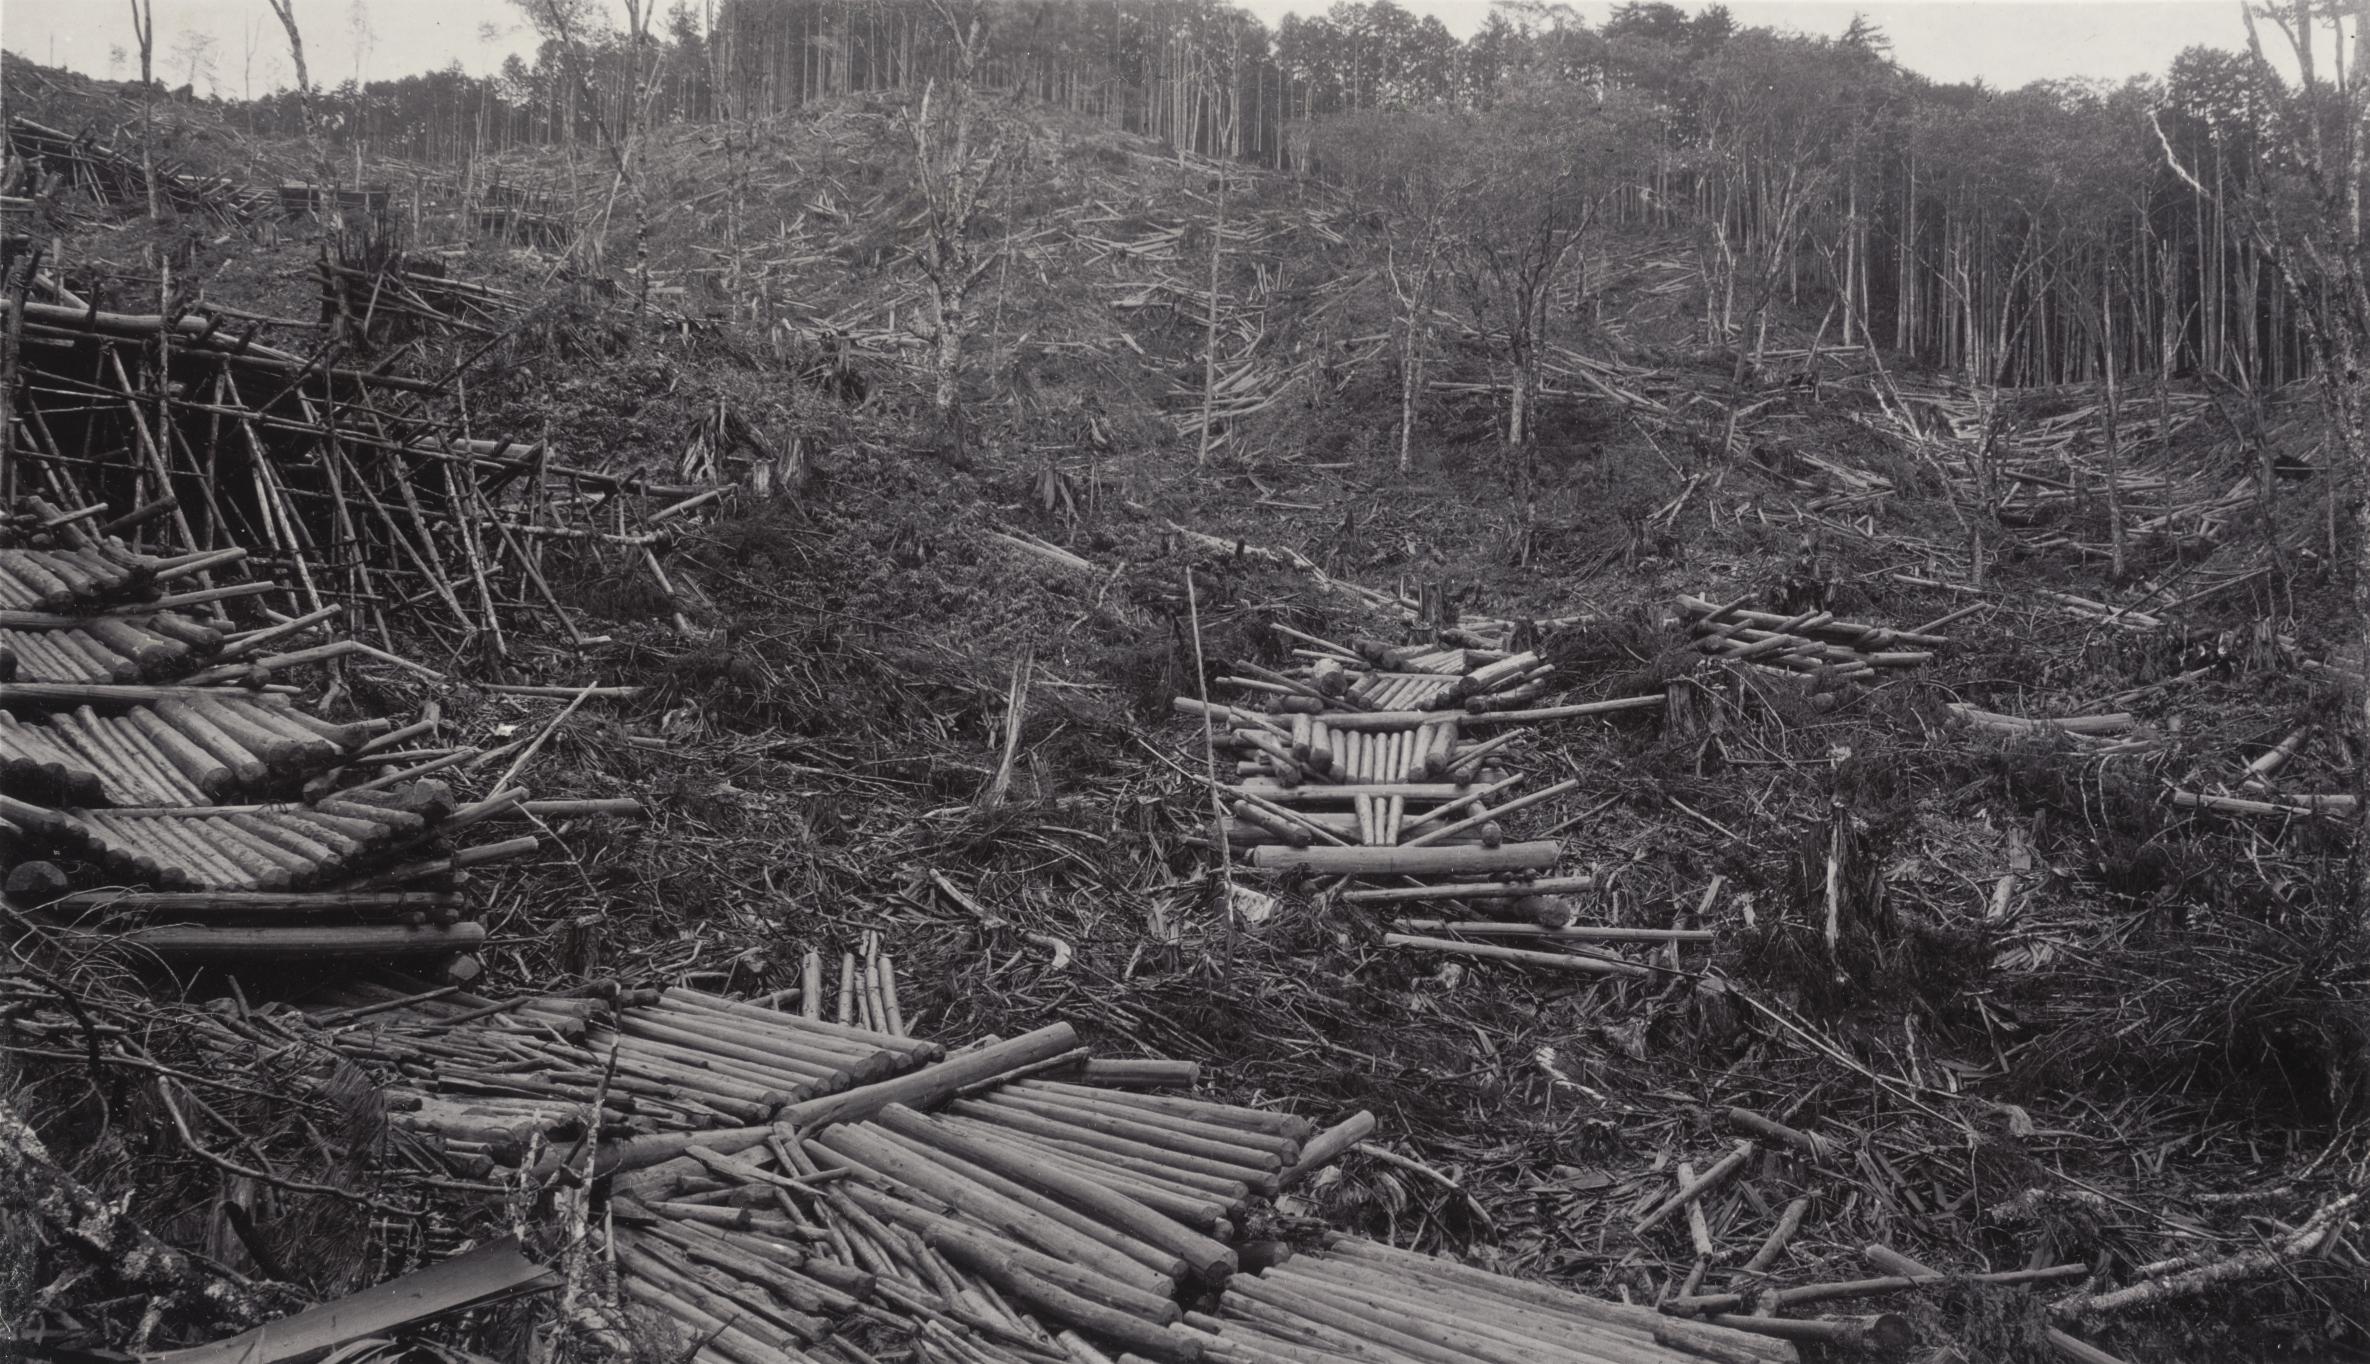 A timber slide of Chamaecyparis obtusa Ogawa forest, Kiso, Japan, photographed by John Jack on September 5, 1905. Altitude 4500 feet (1372 m).